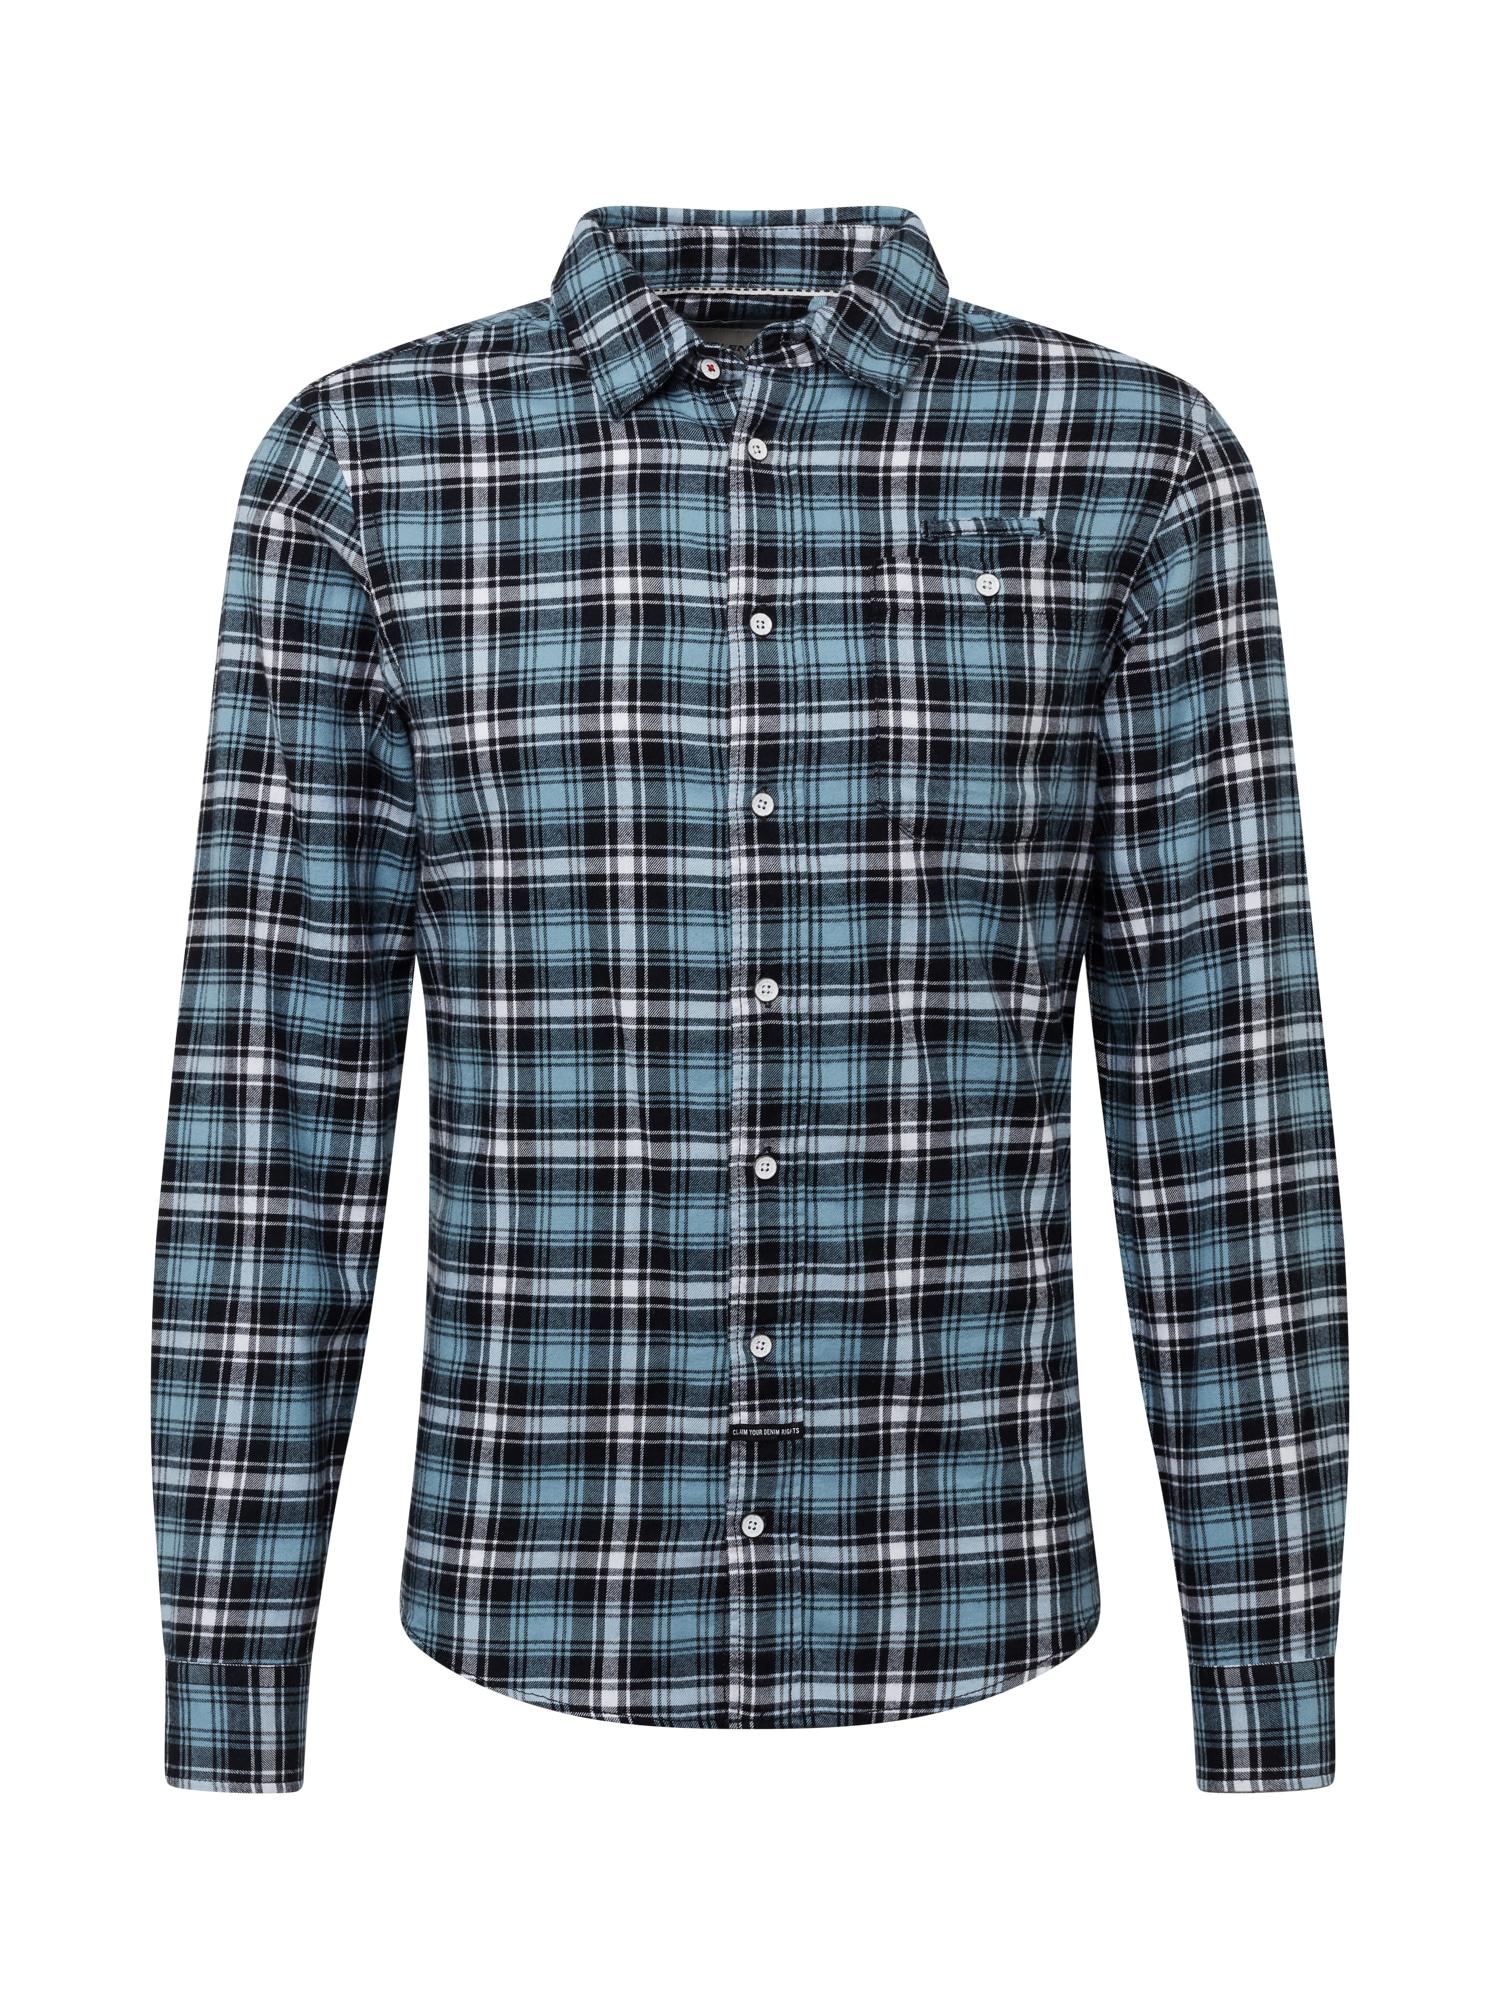 BLEND Marškiniai mėlyna / balta / juoda